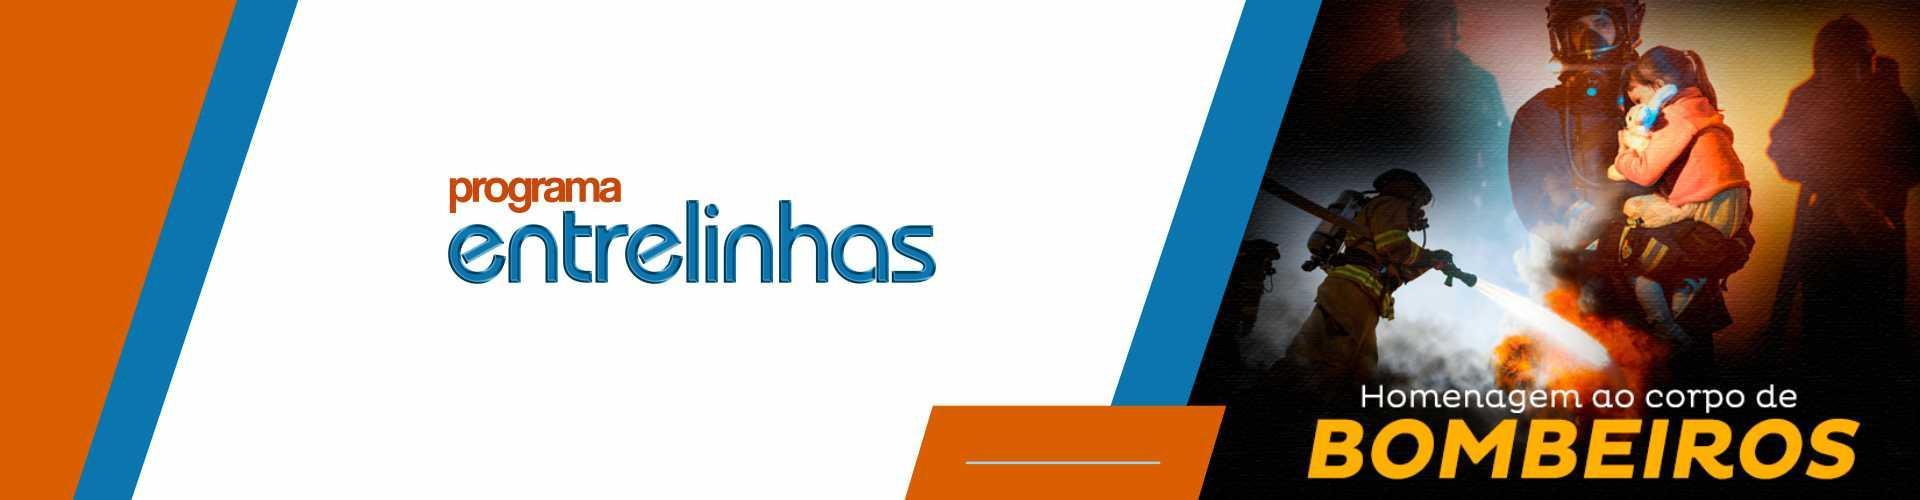 Banner Entrelinhas